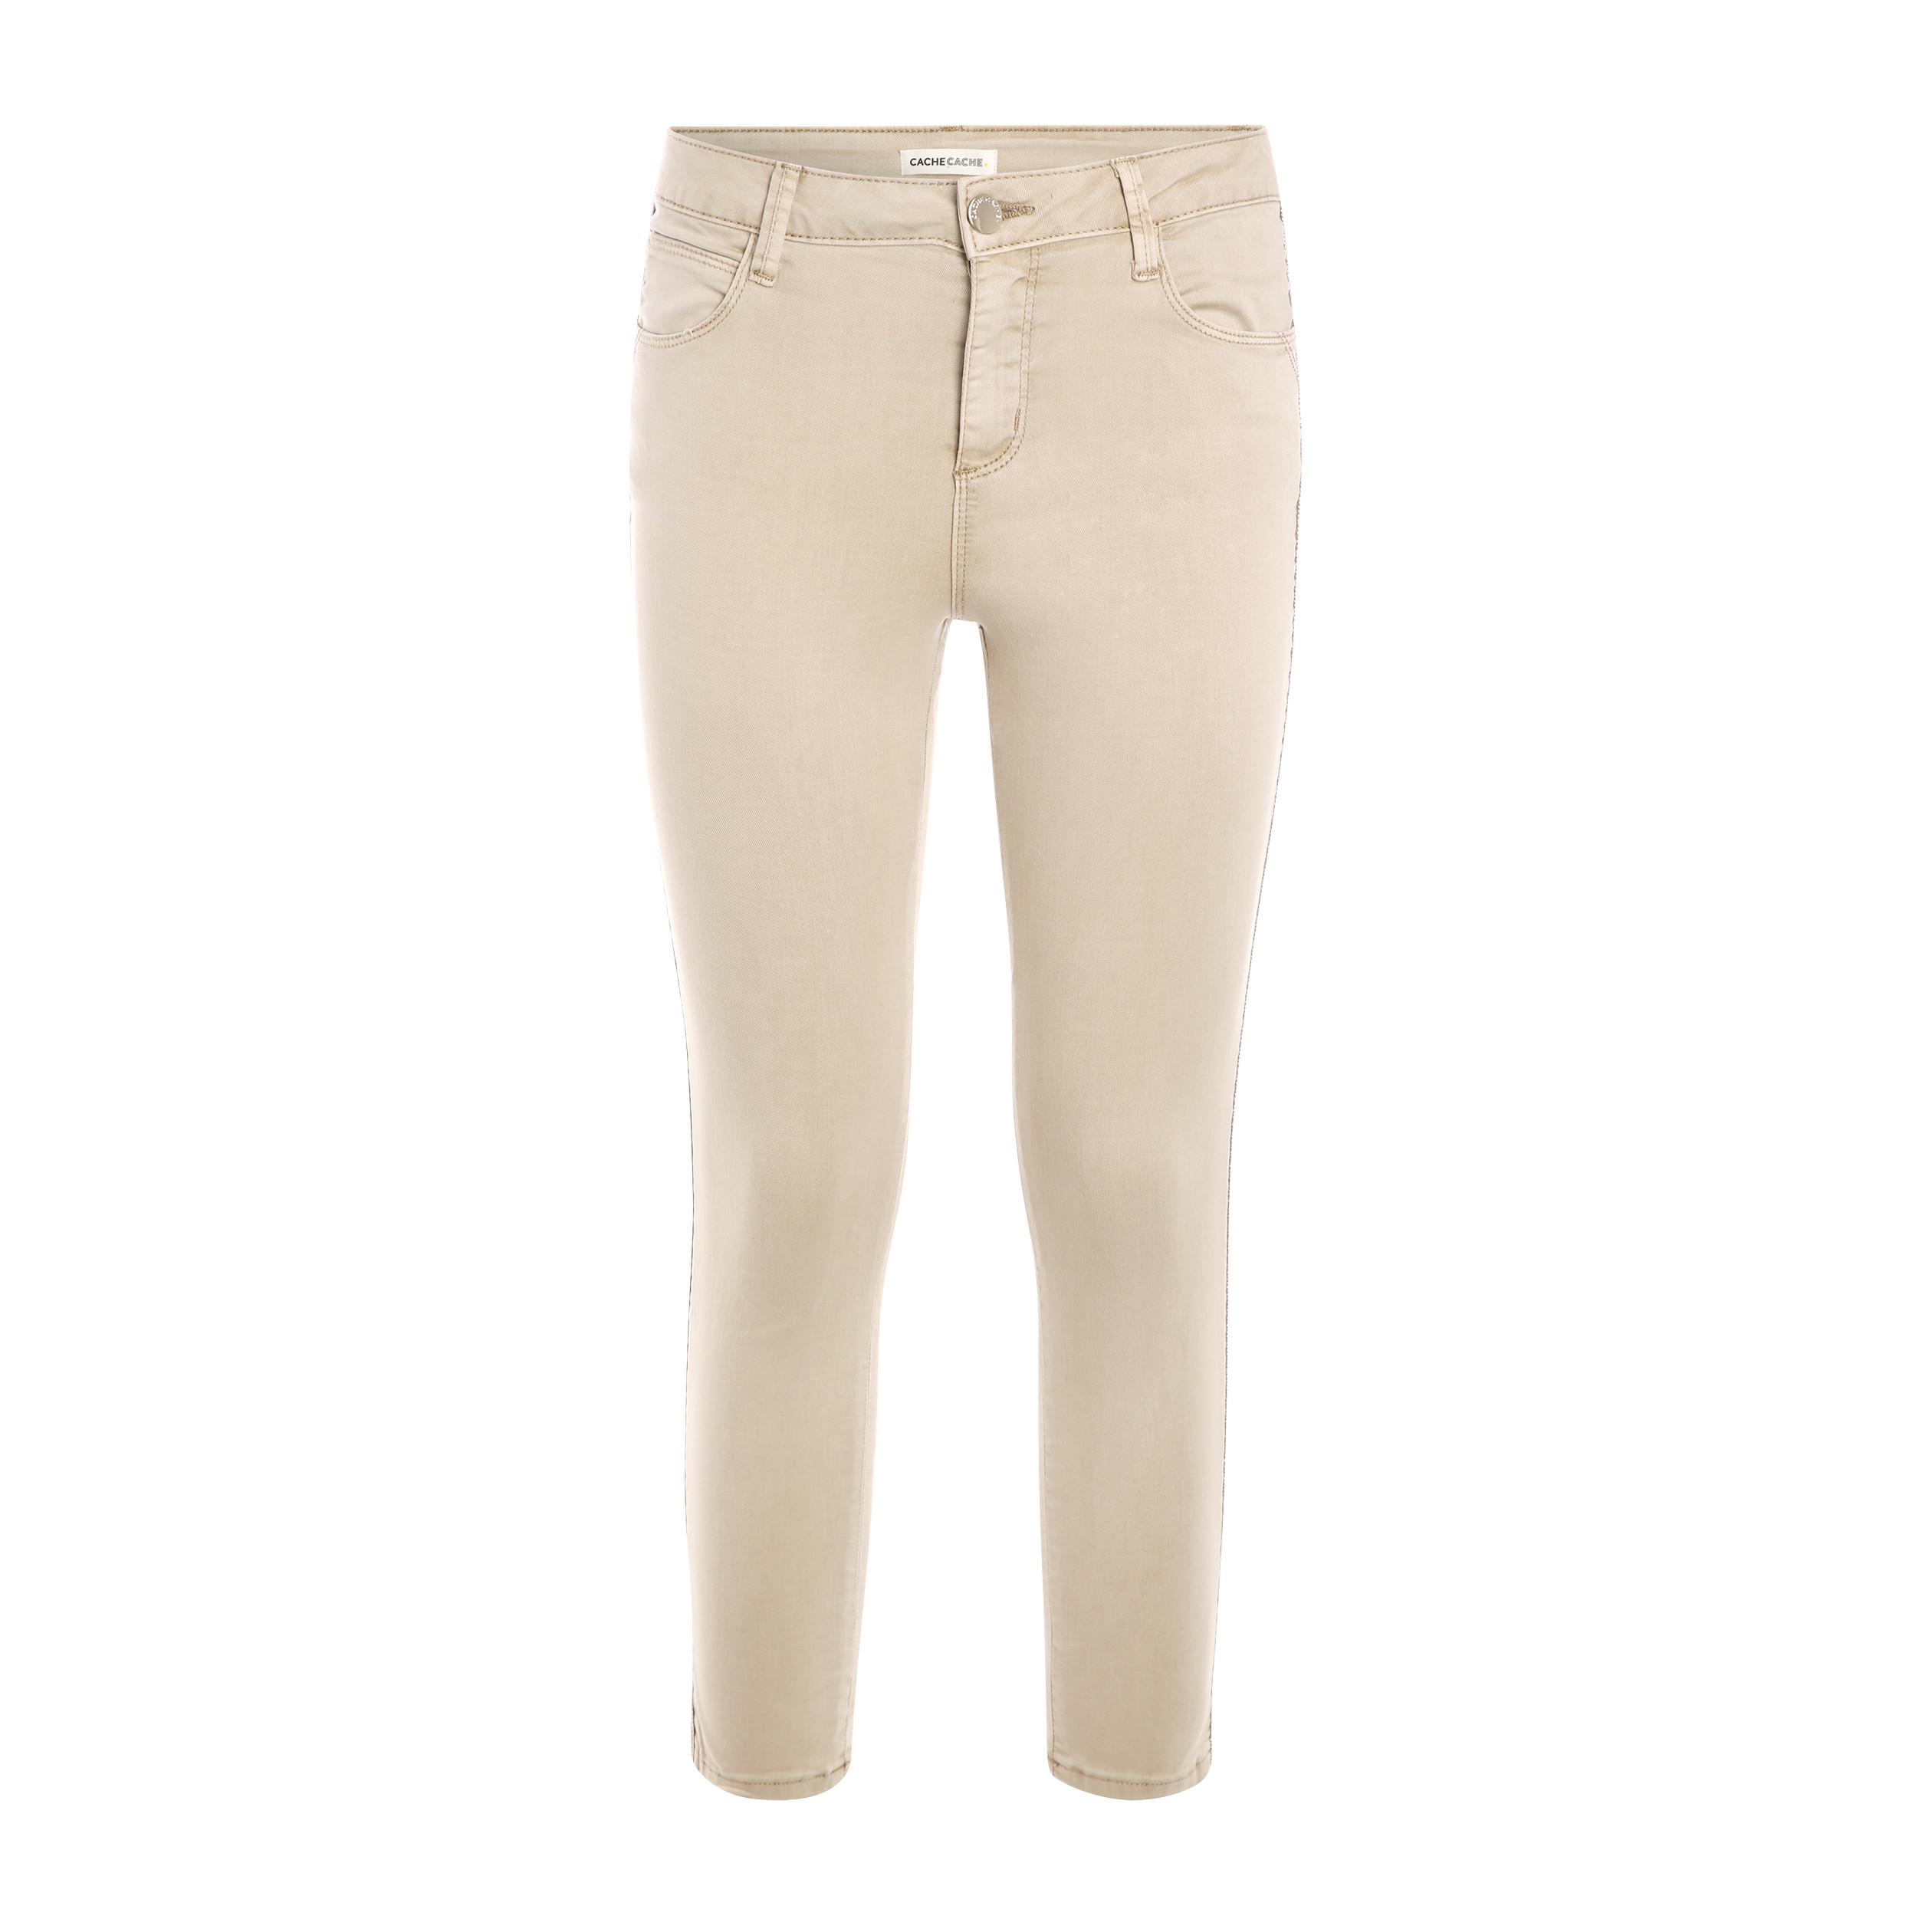 Pantalon Slim Raccourci Slim Pantalon Femme Raccourci Ecru YDHI2EW9